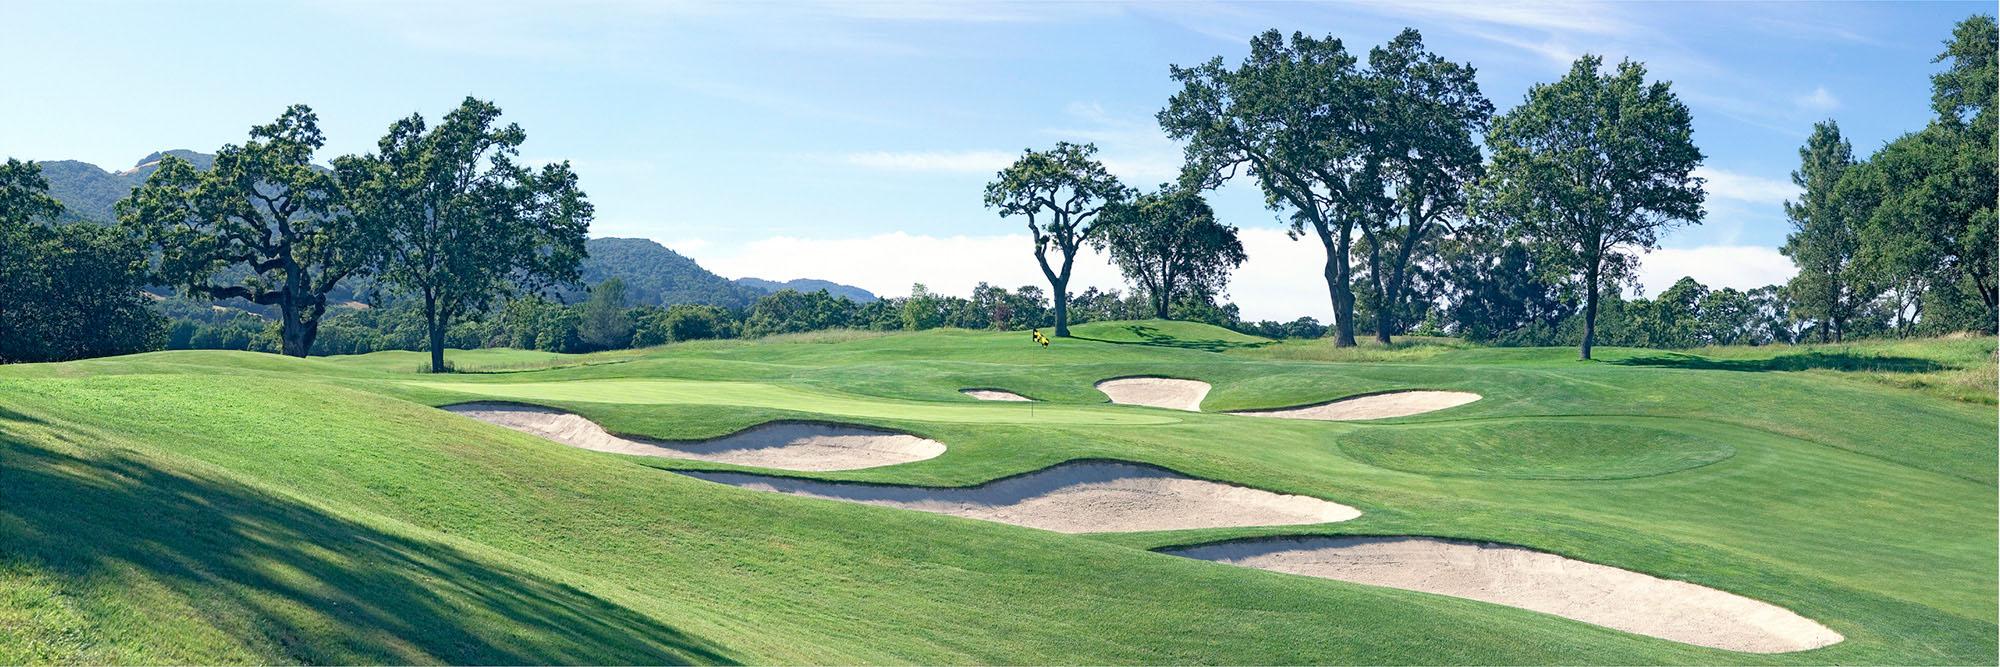 Golf Course Image - Sonoma No. 11